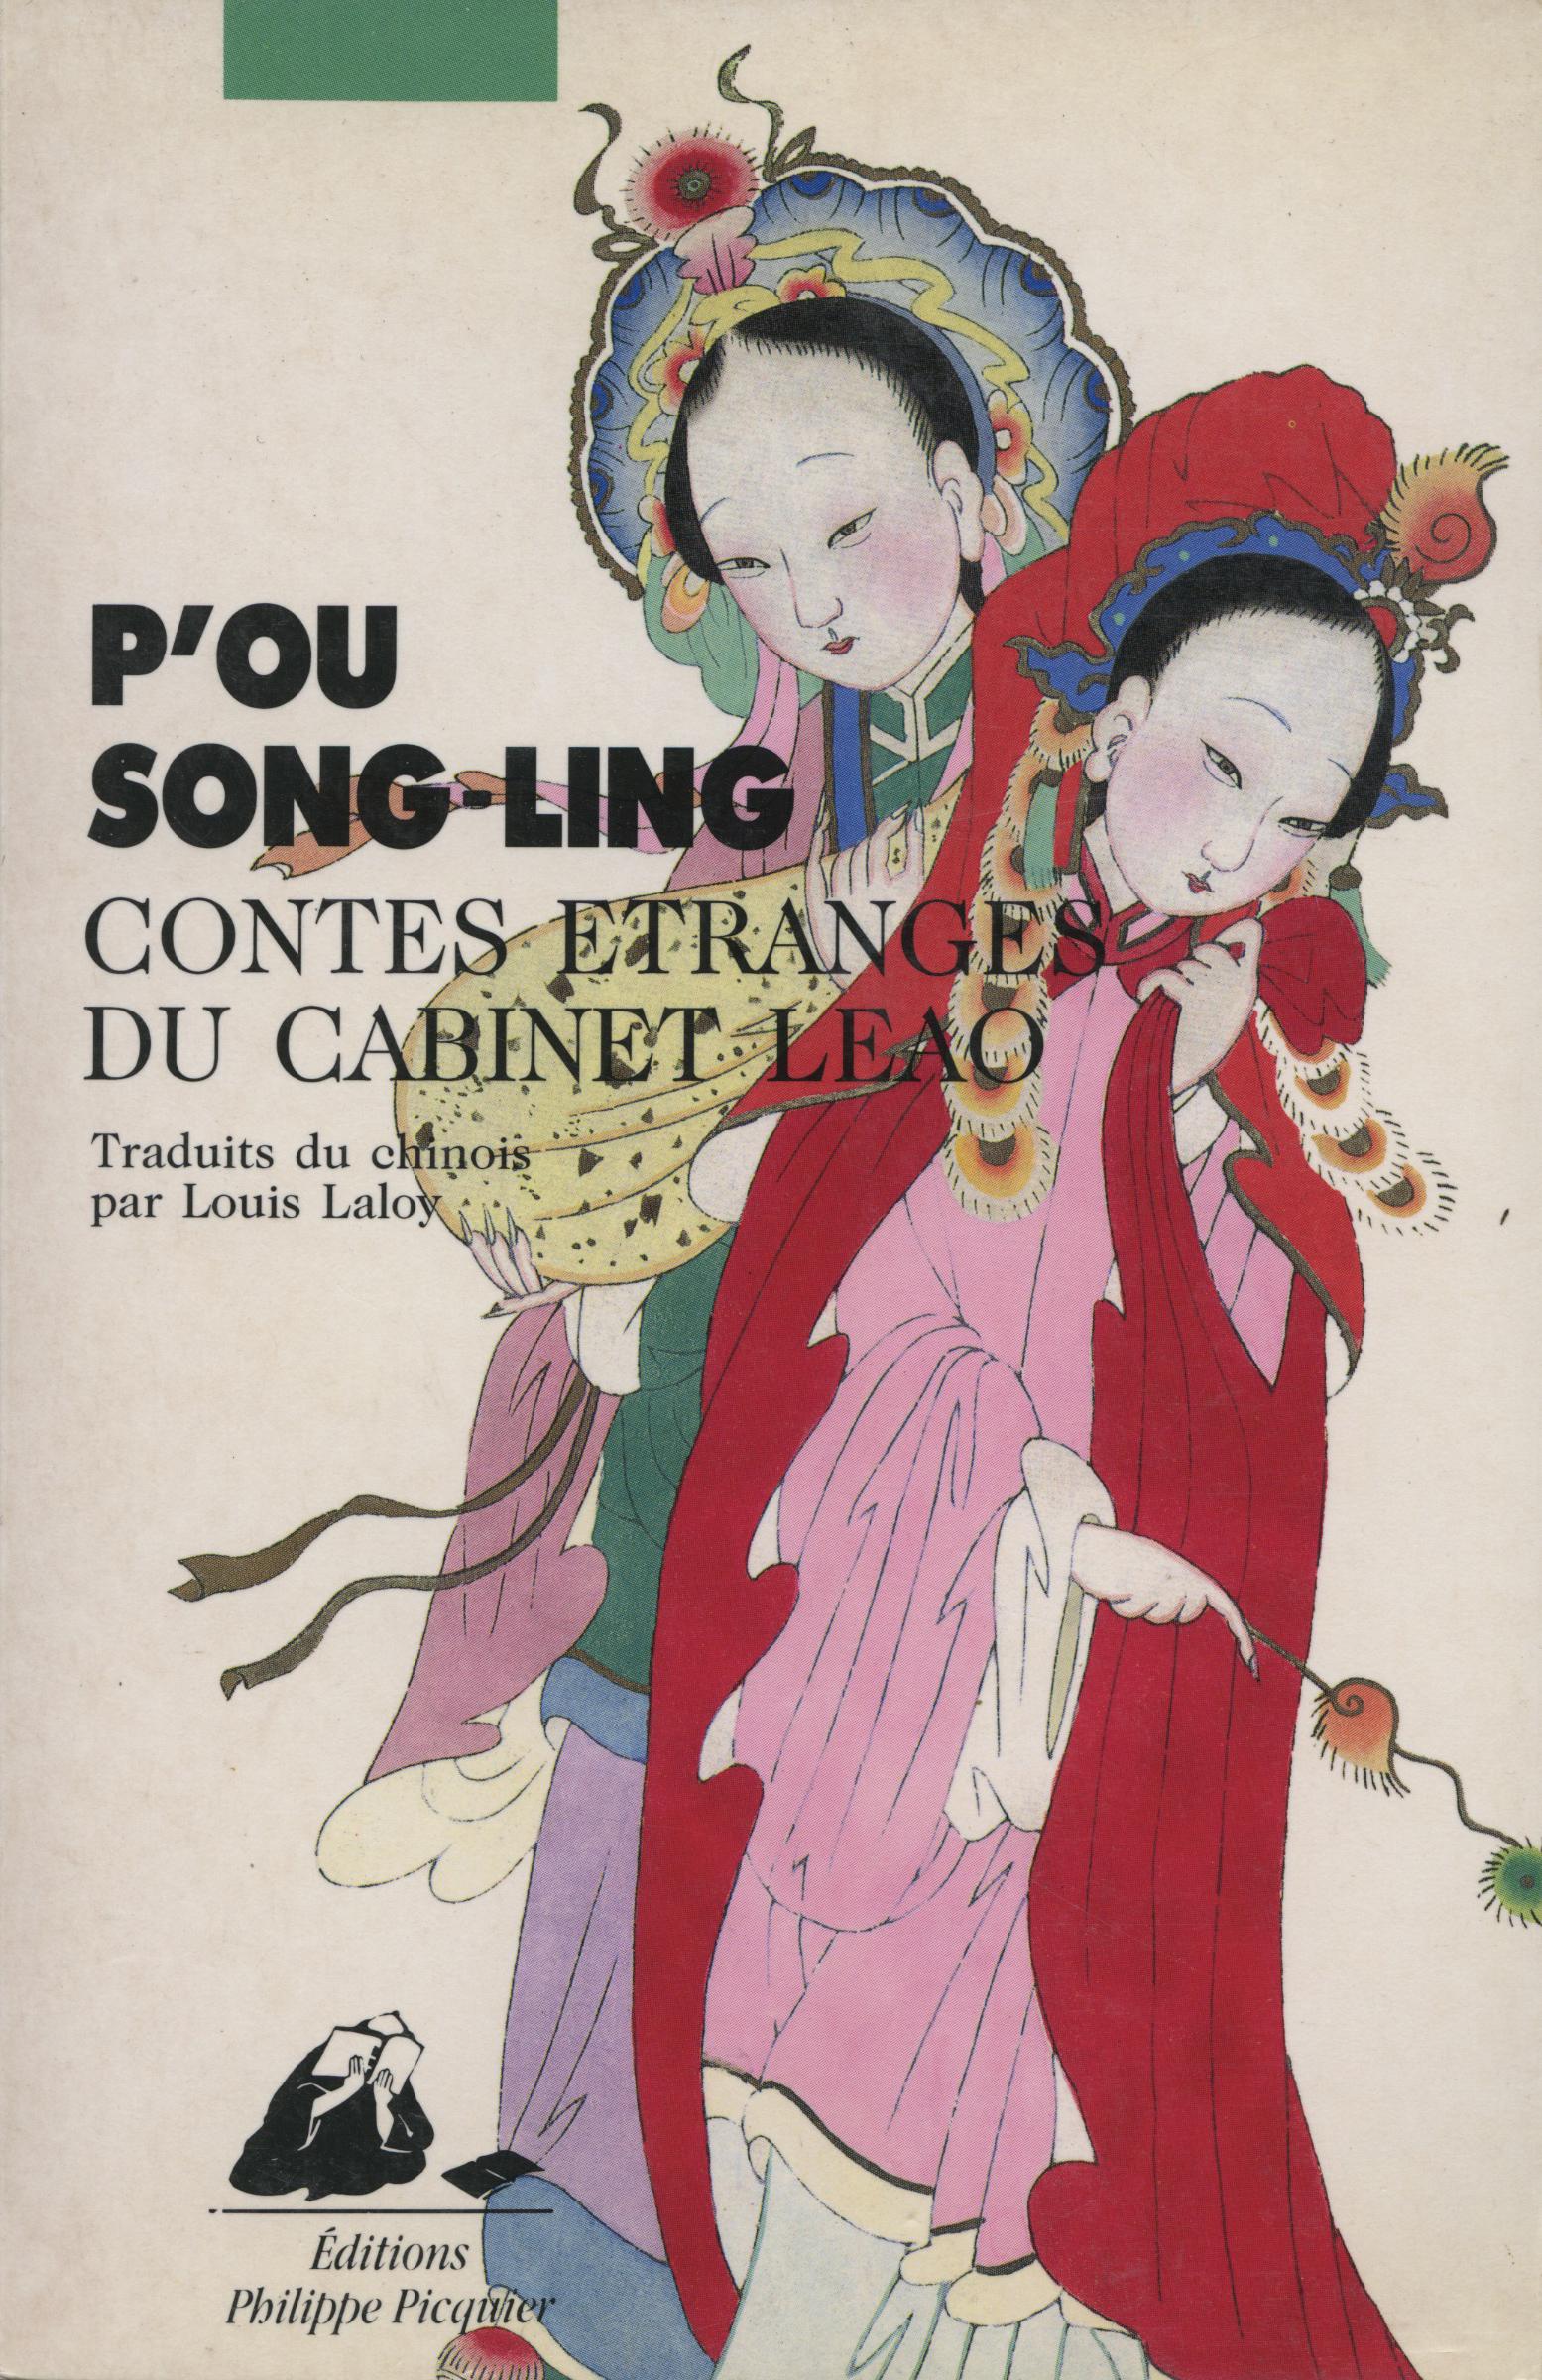 8ac15bf3c2 Contes étranges du cabinet Leao - Editions Picquier